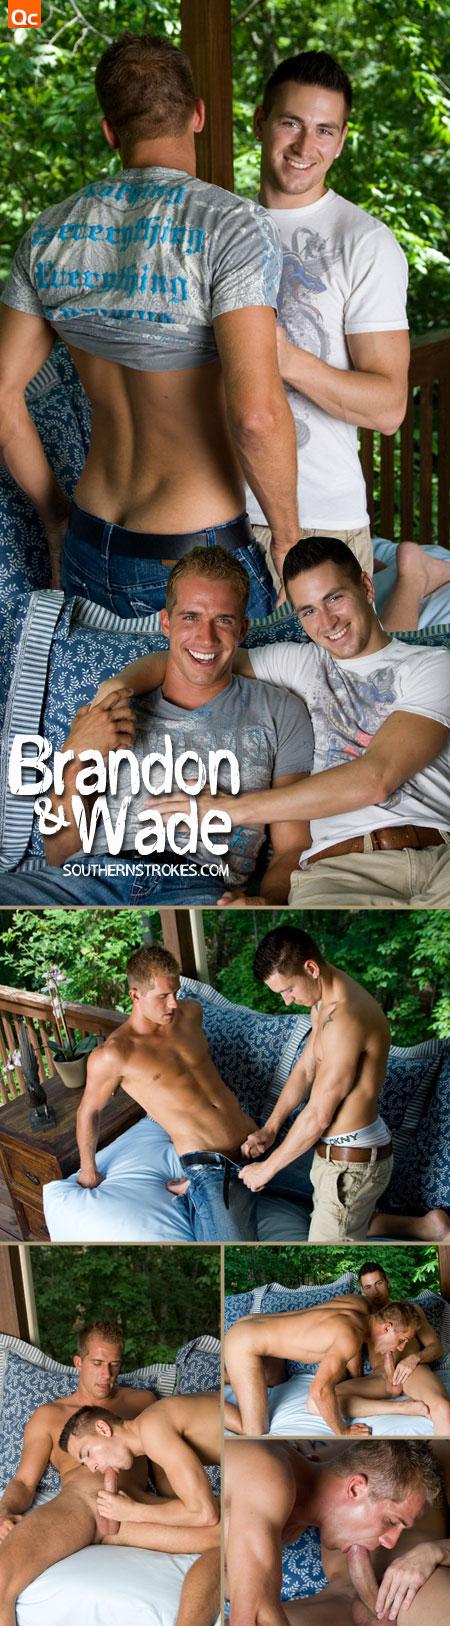 southern strokes brandon wade